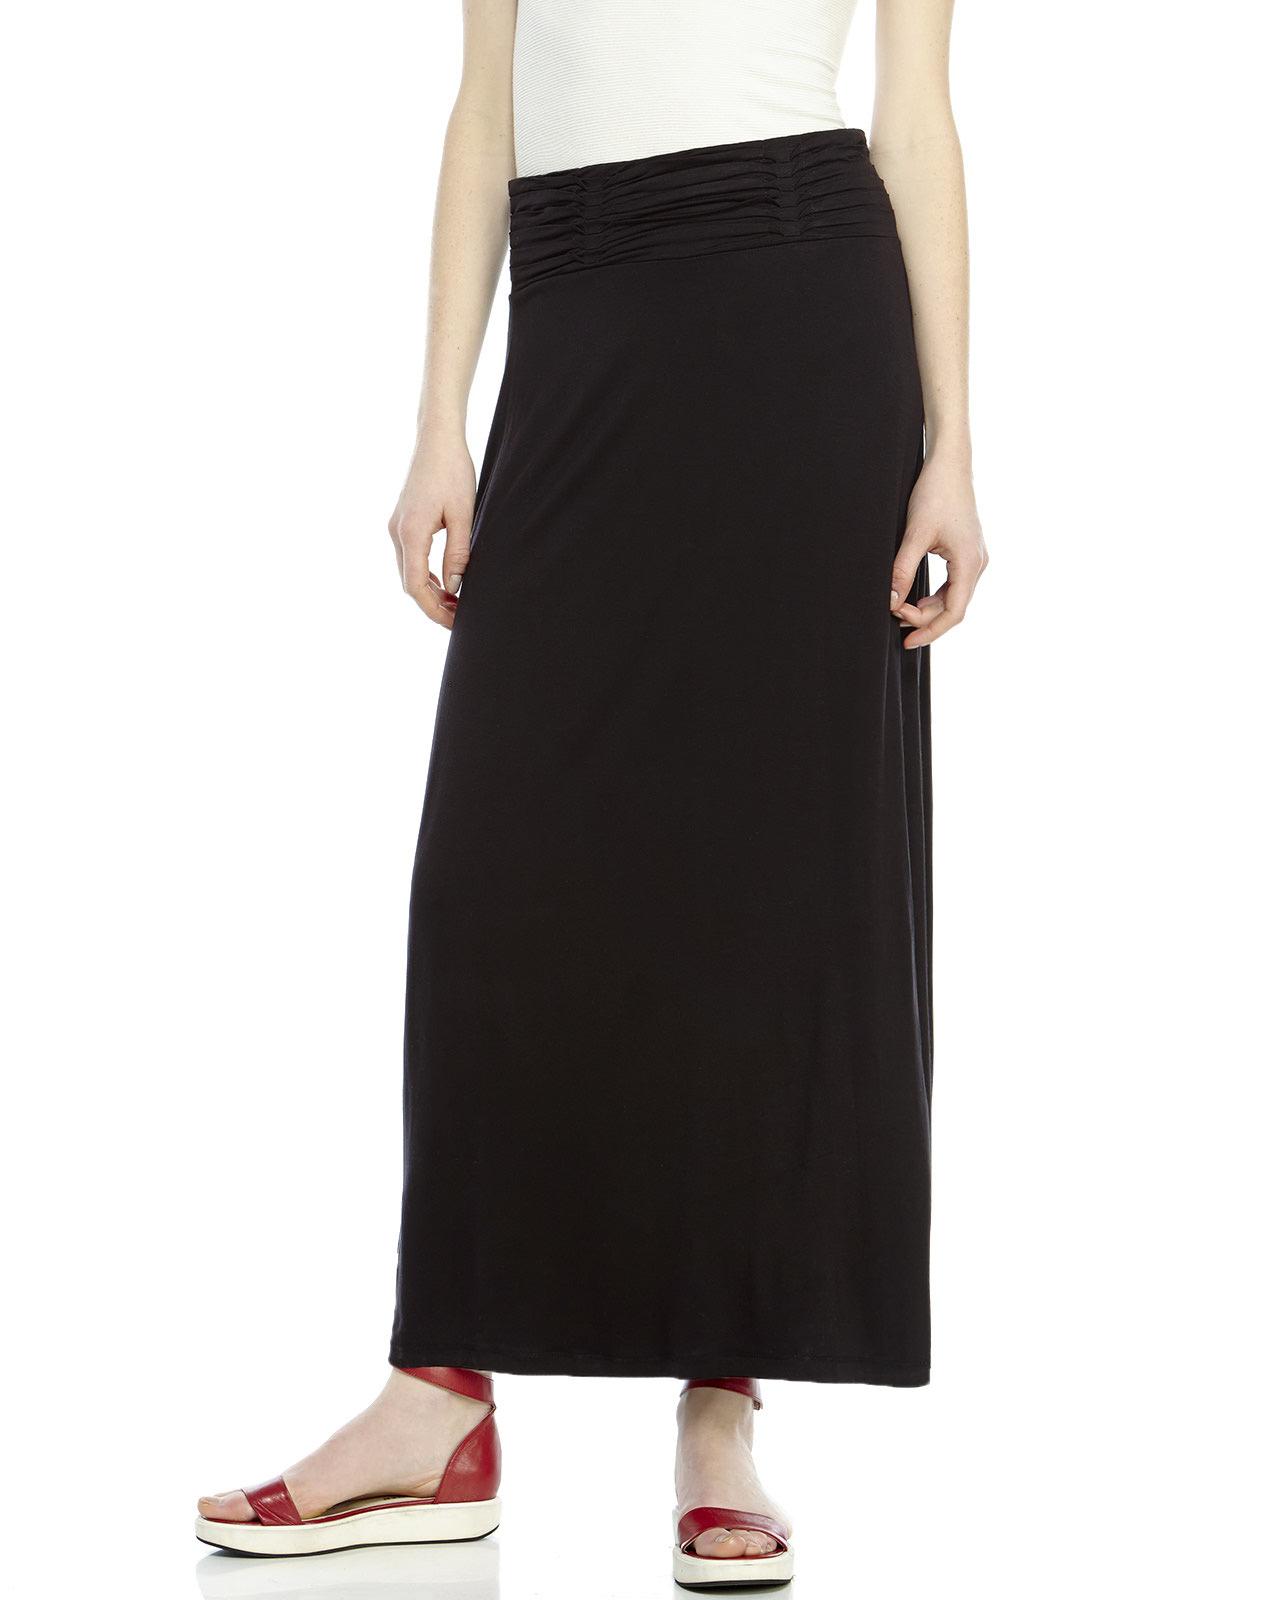 Brilliant Petite long black skirt something and